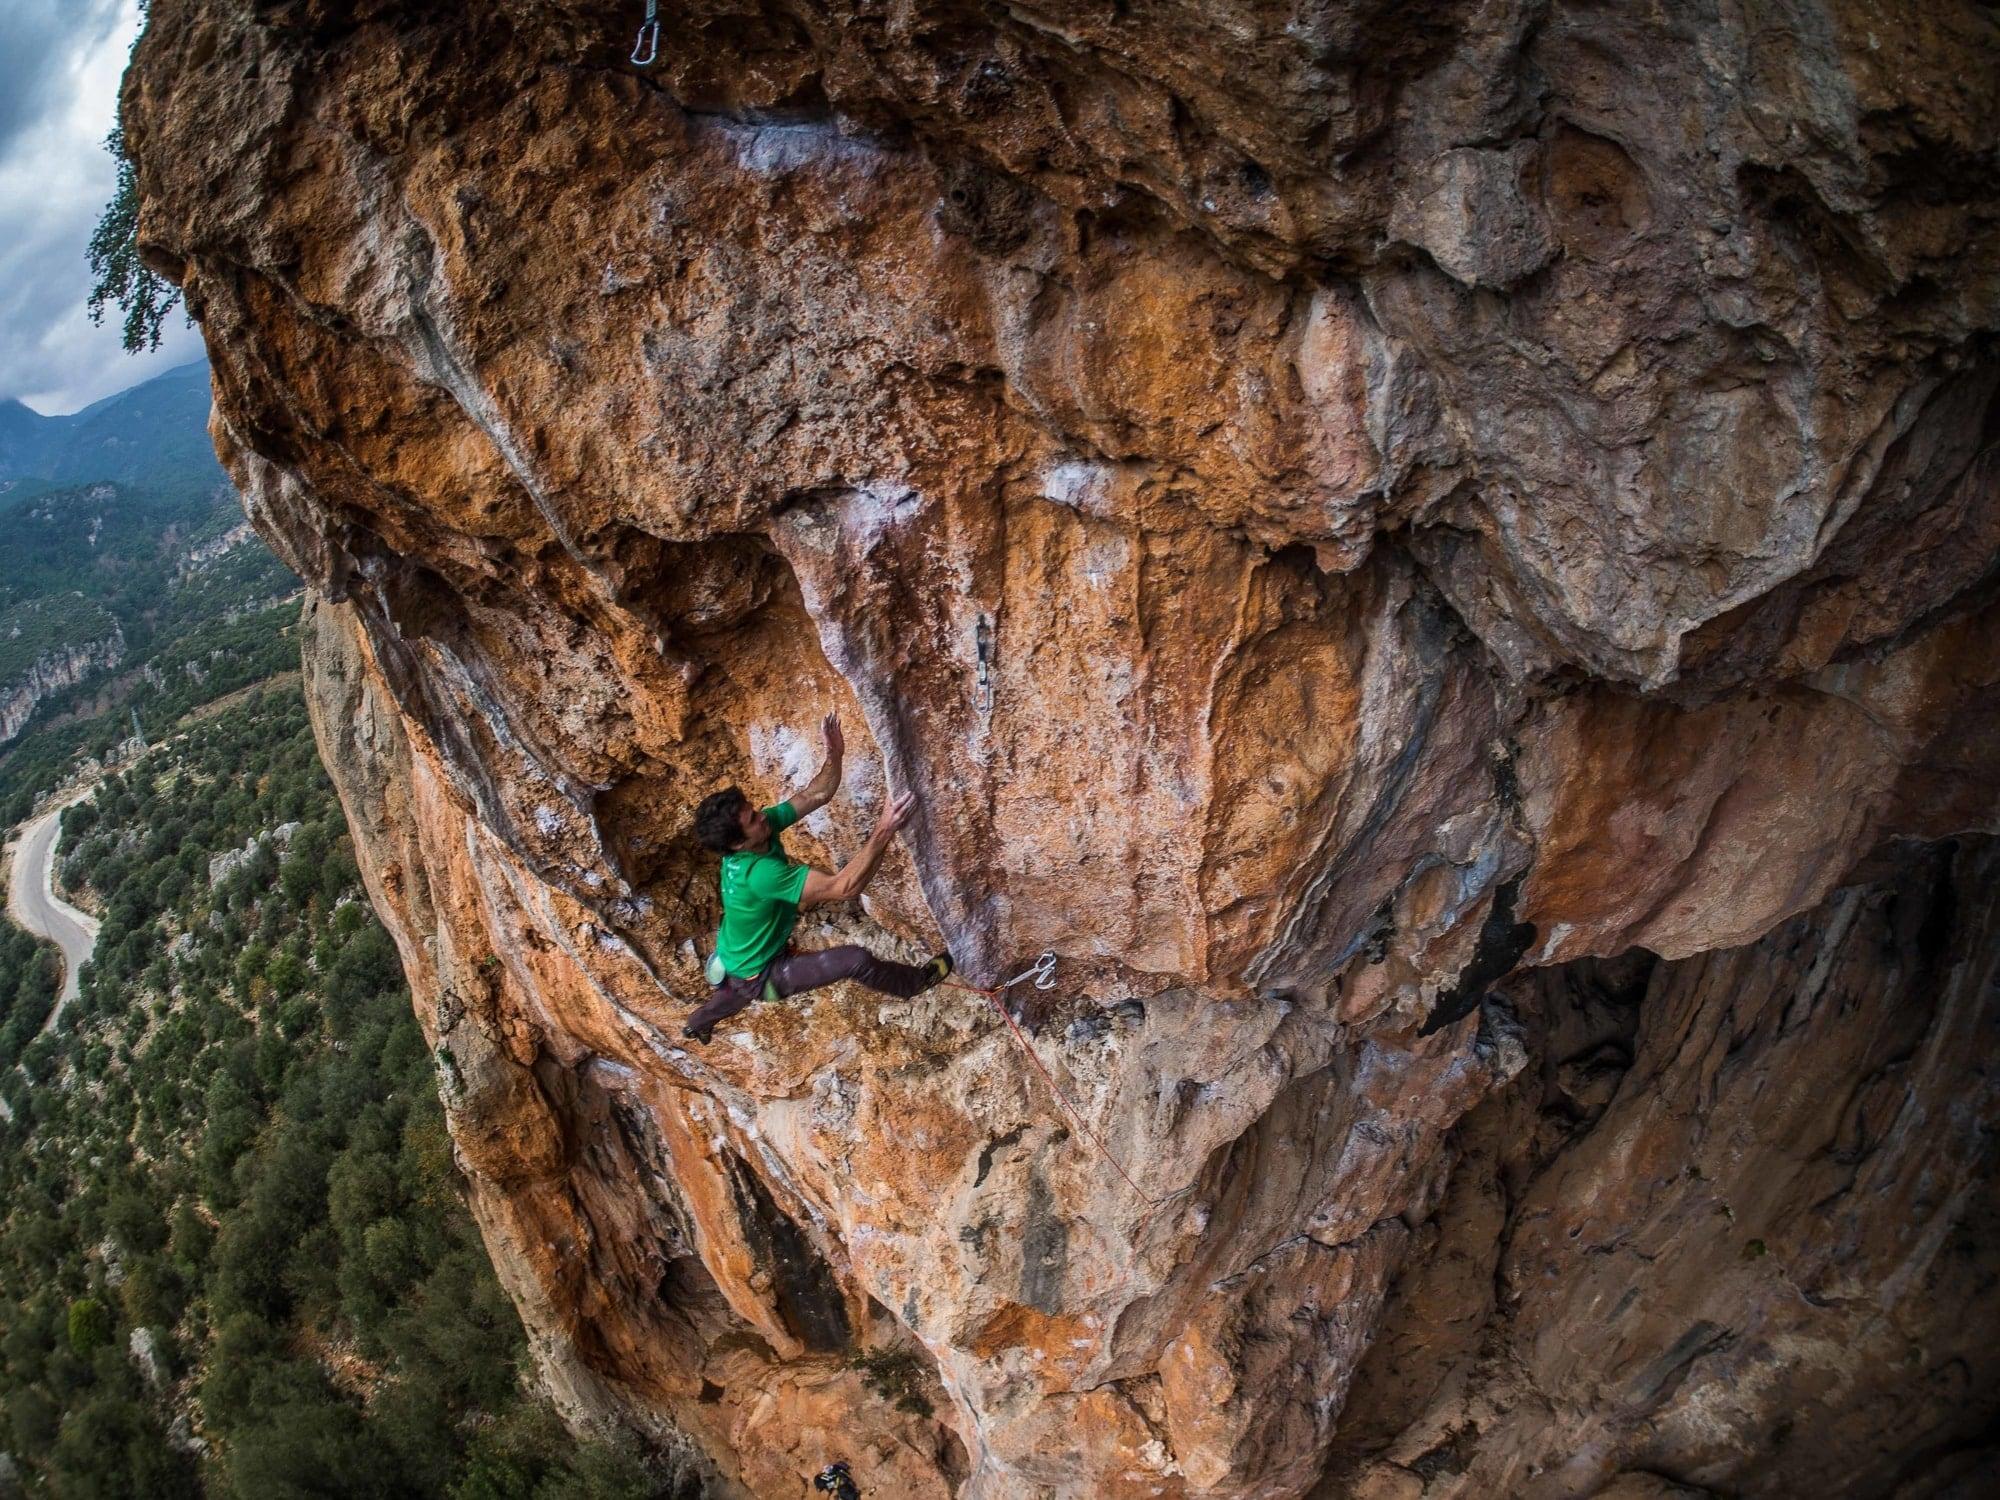 Climbing Destination Guide: Turkey